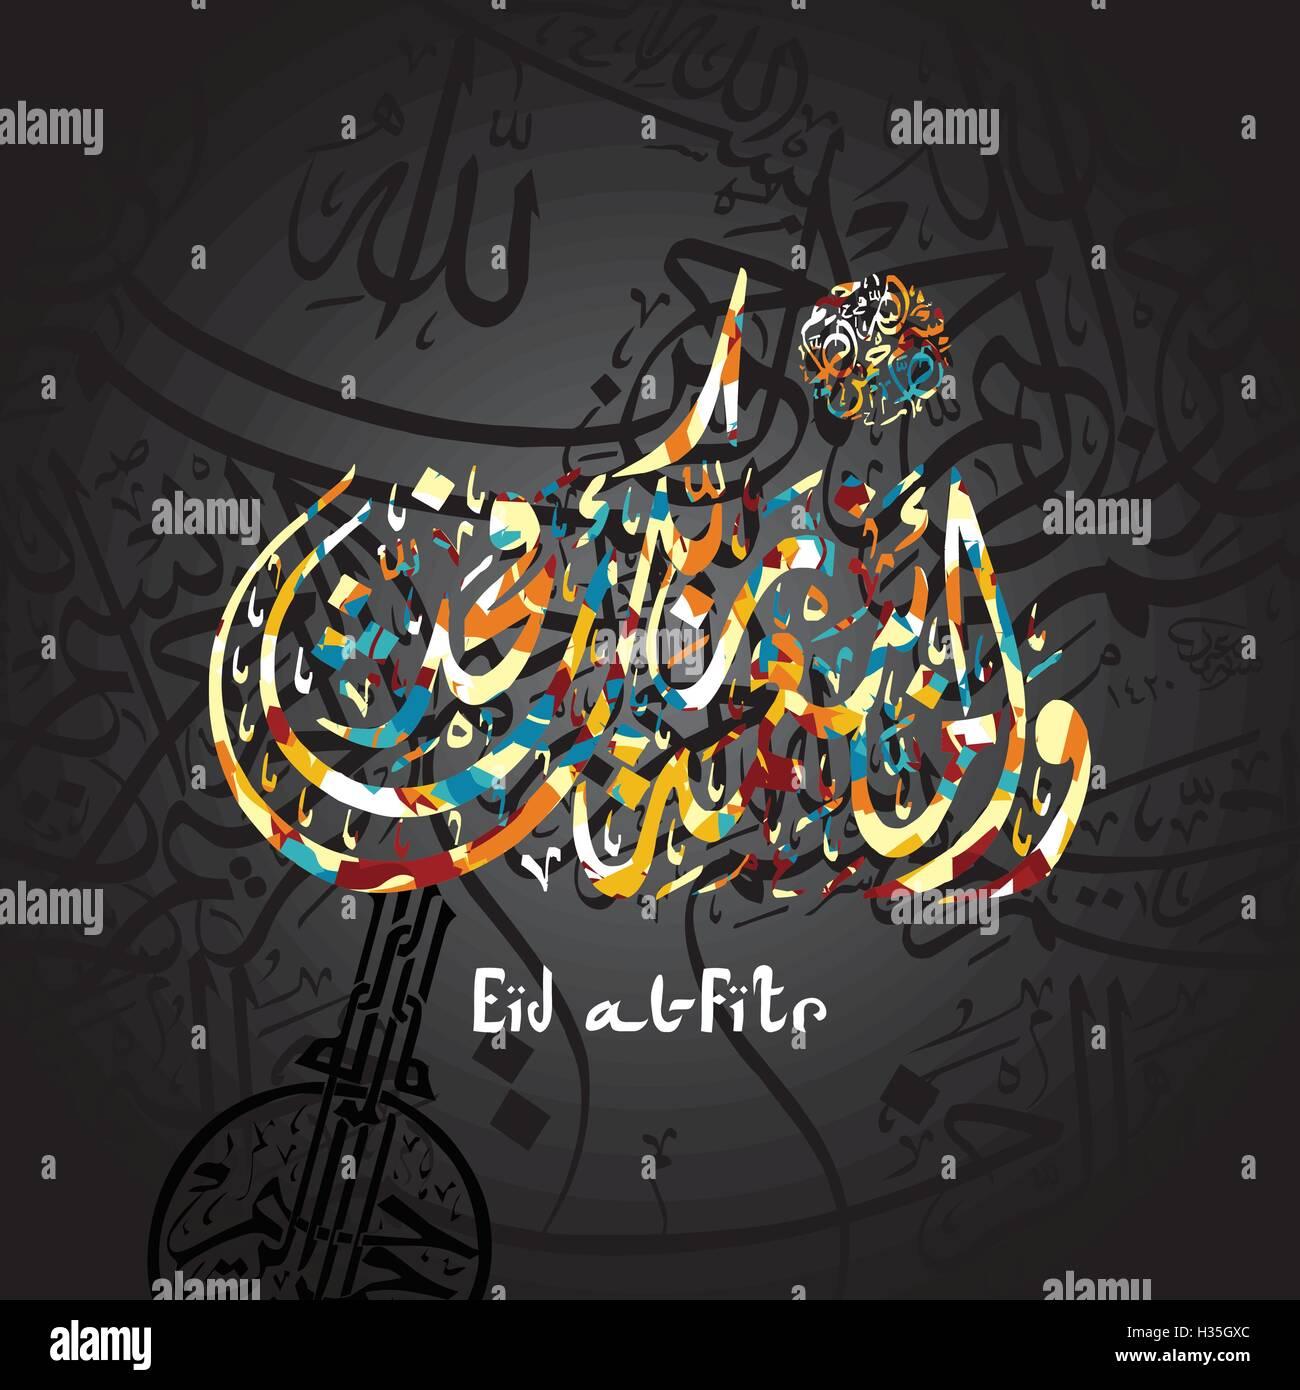 Happy Eid Mubarak Greetings Arabic Calligraphy Art Stock Vector Art